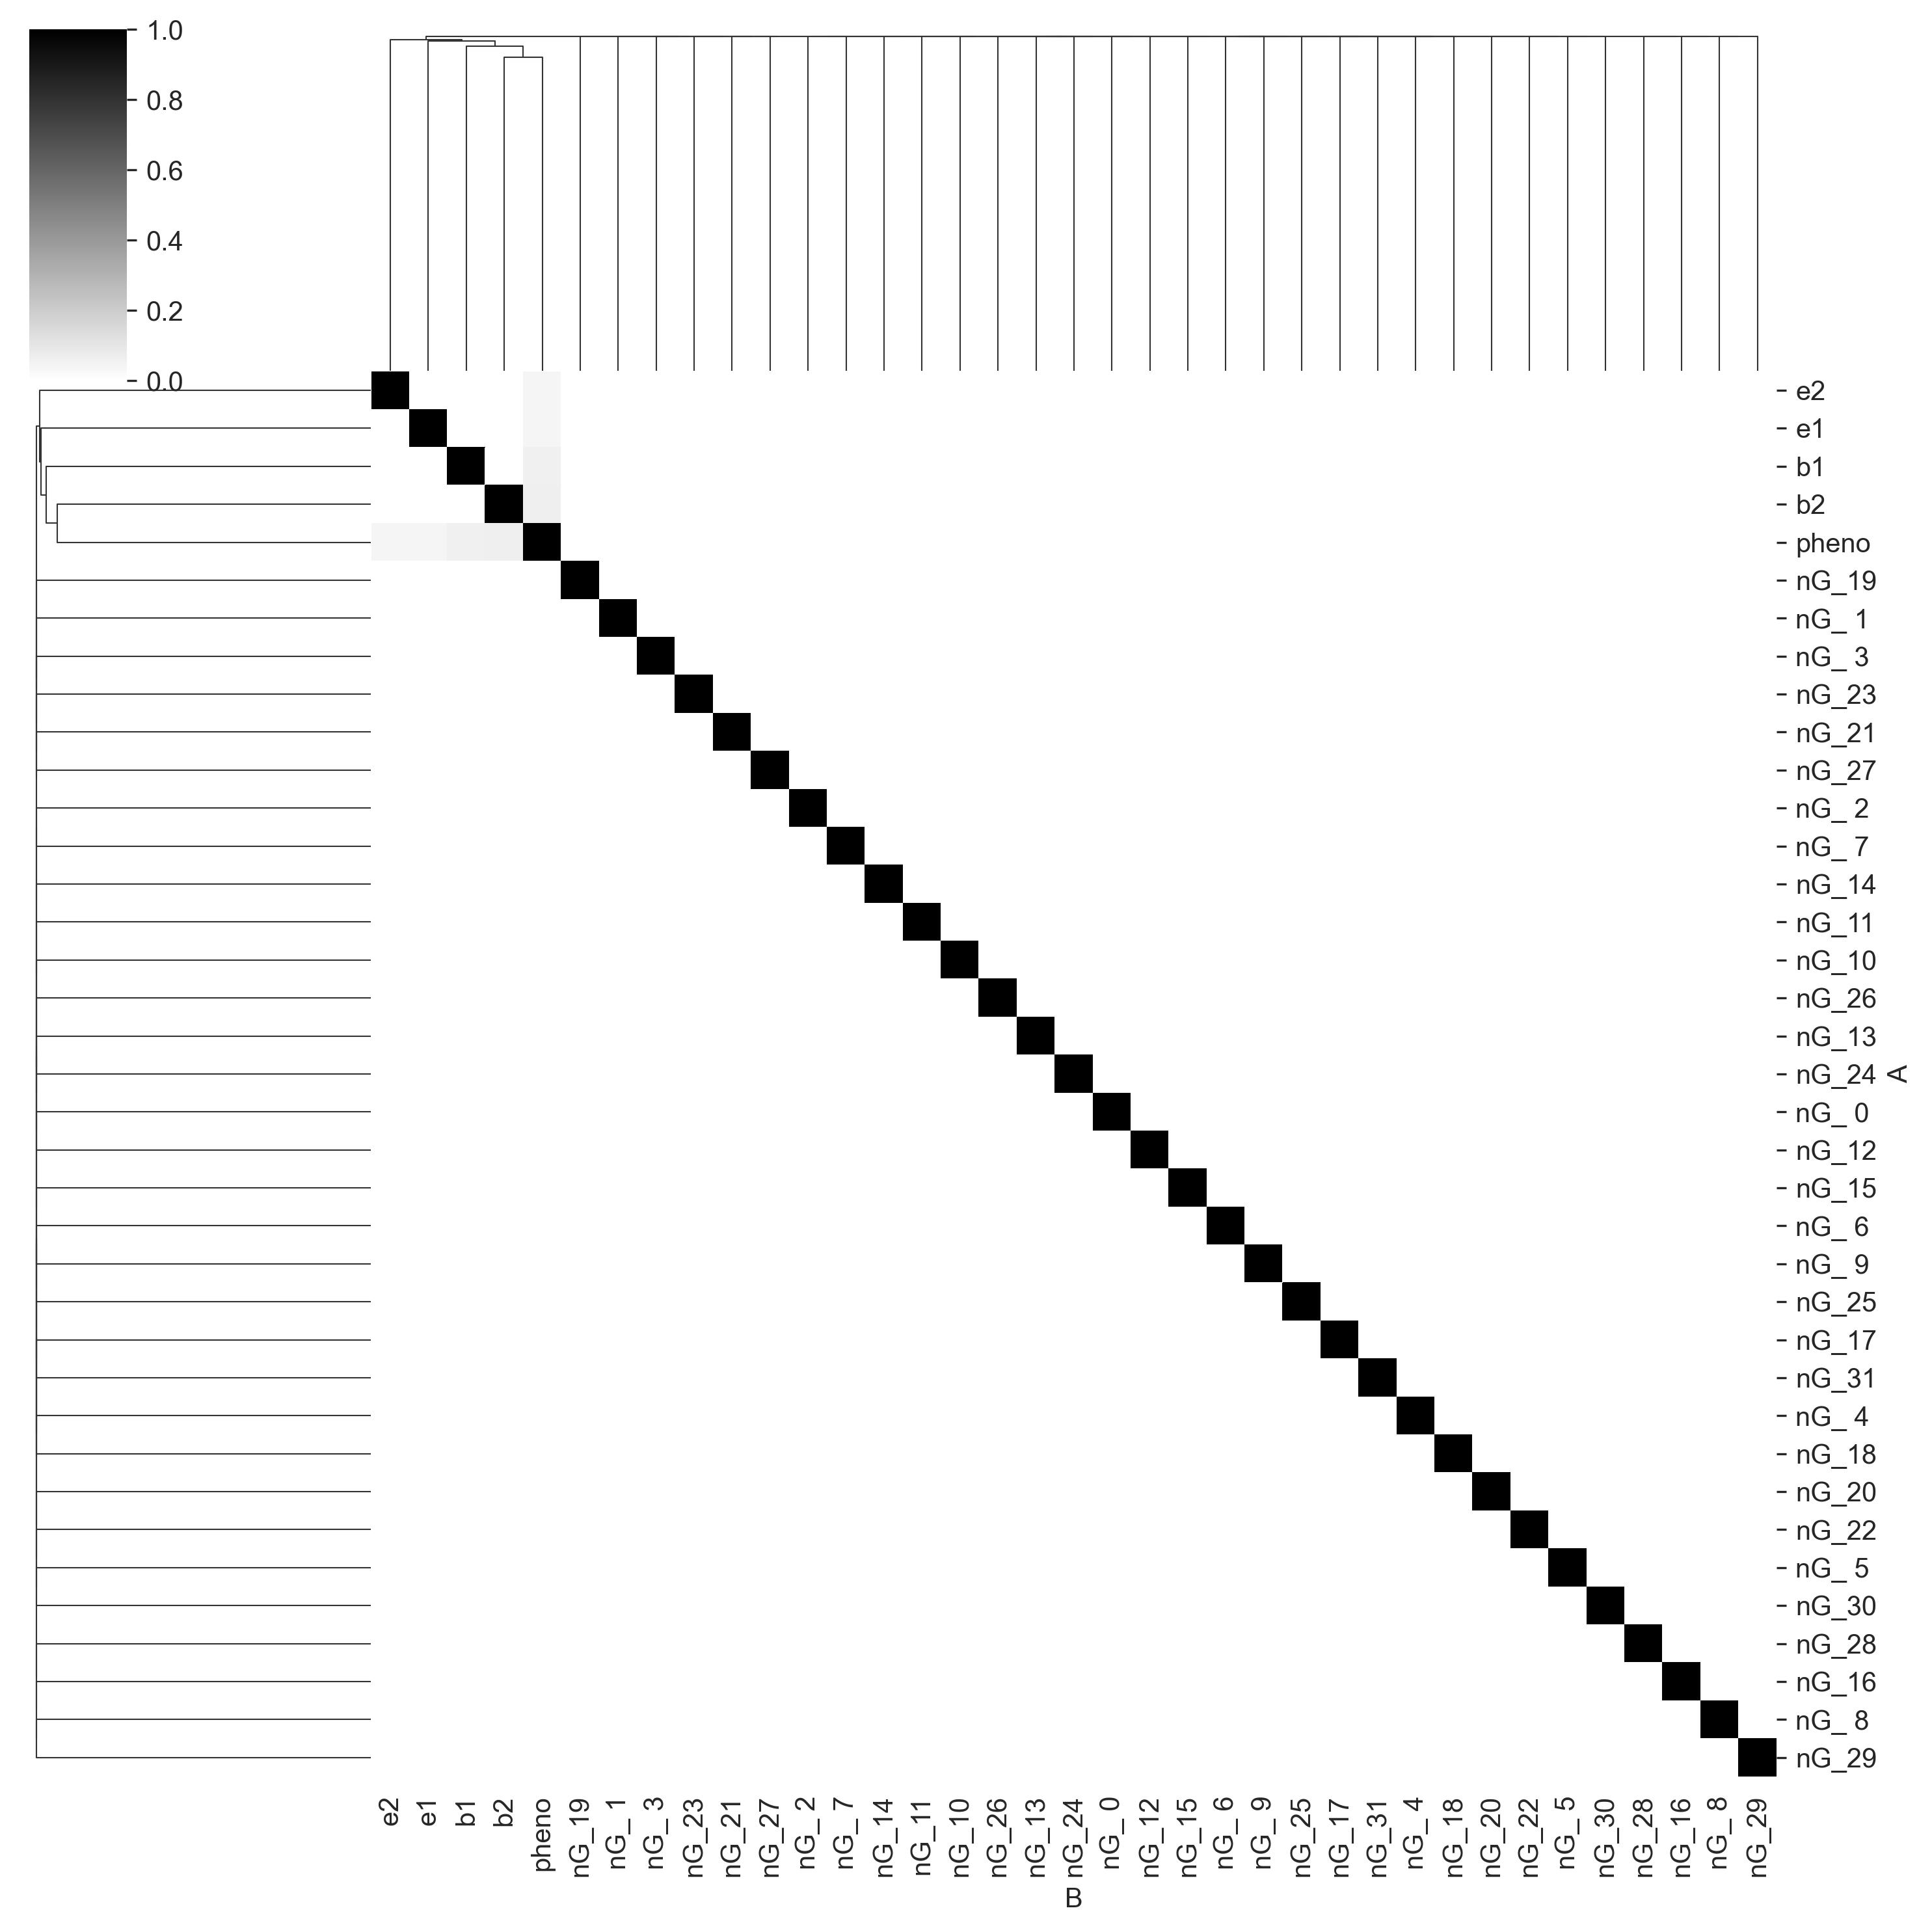 Mutual information matrix